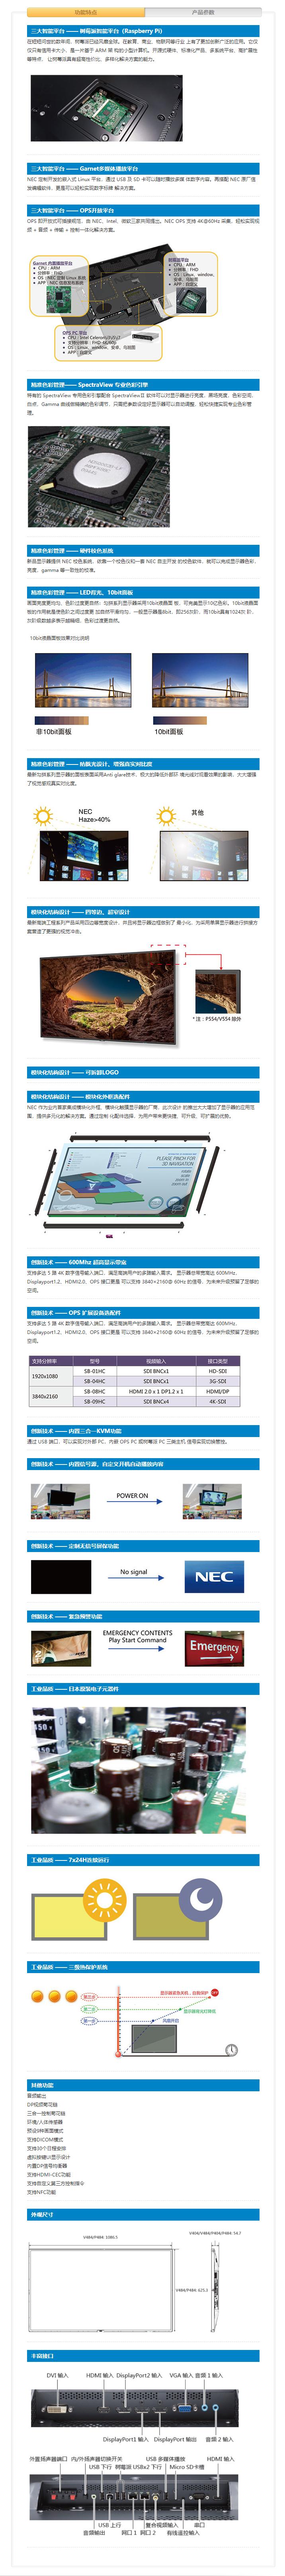 NEC显示器_产品_P484